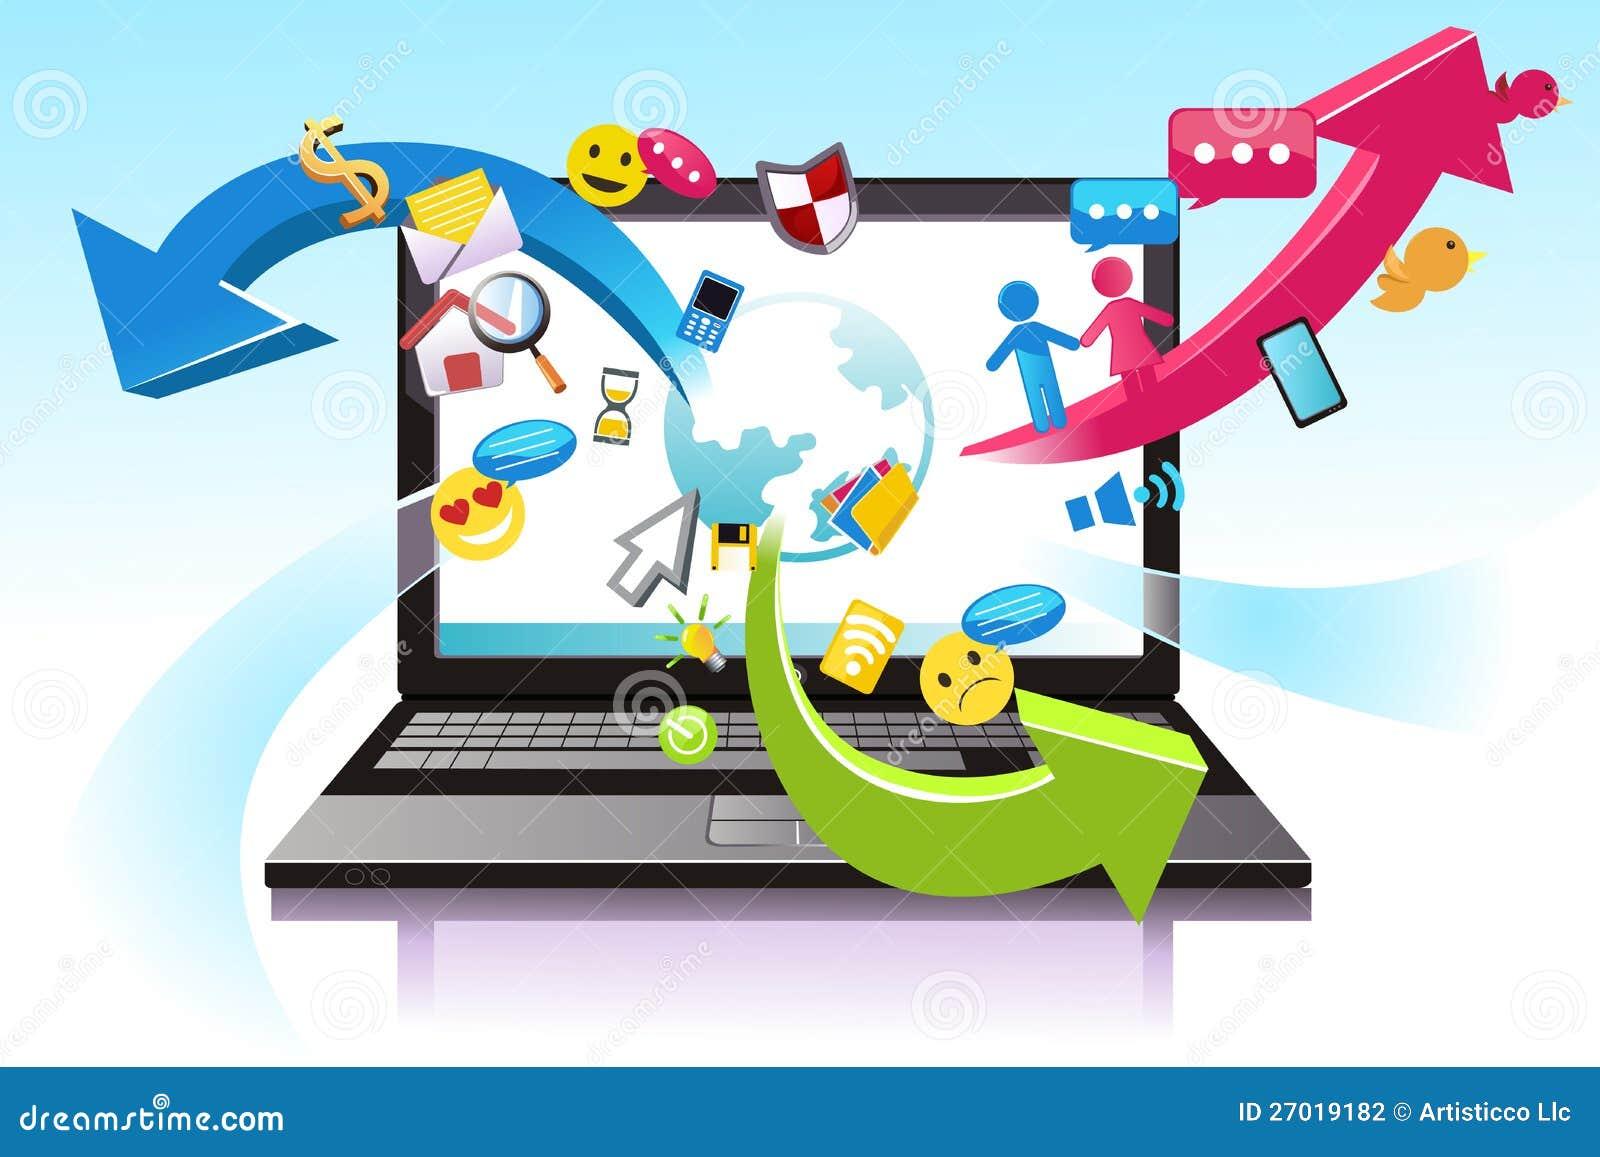 Information technologyInformation Technology Clipart